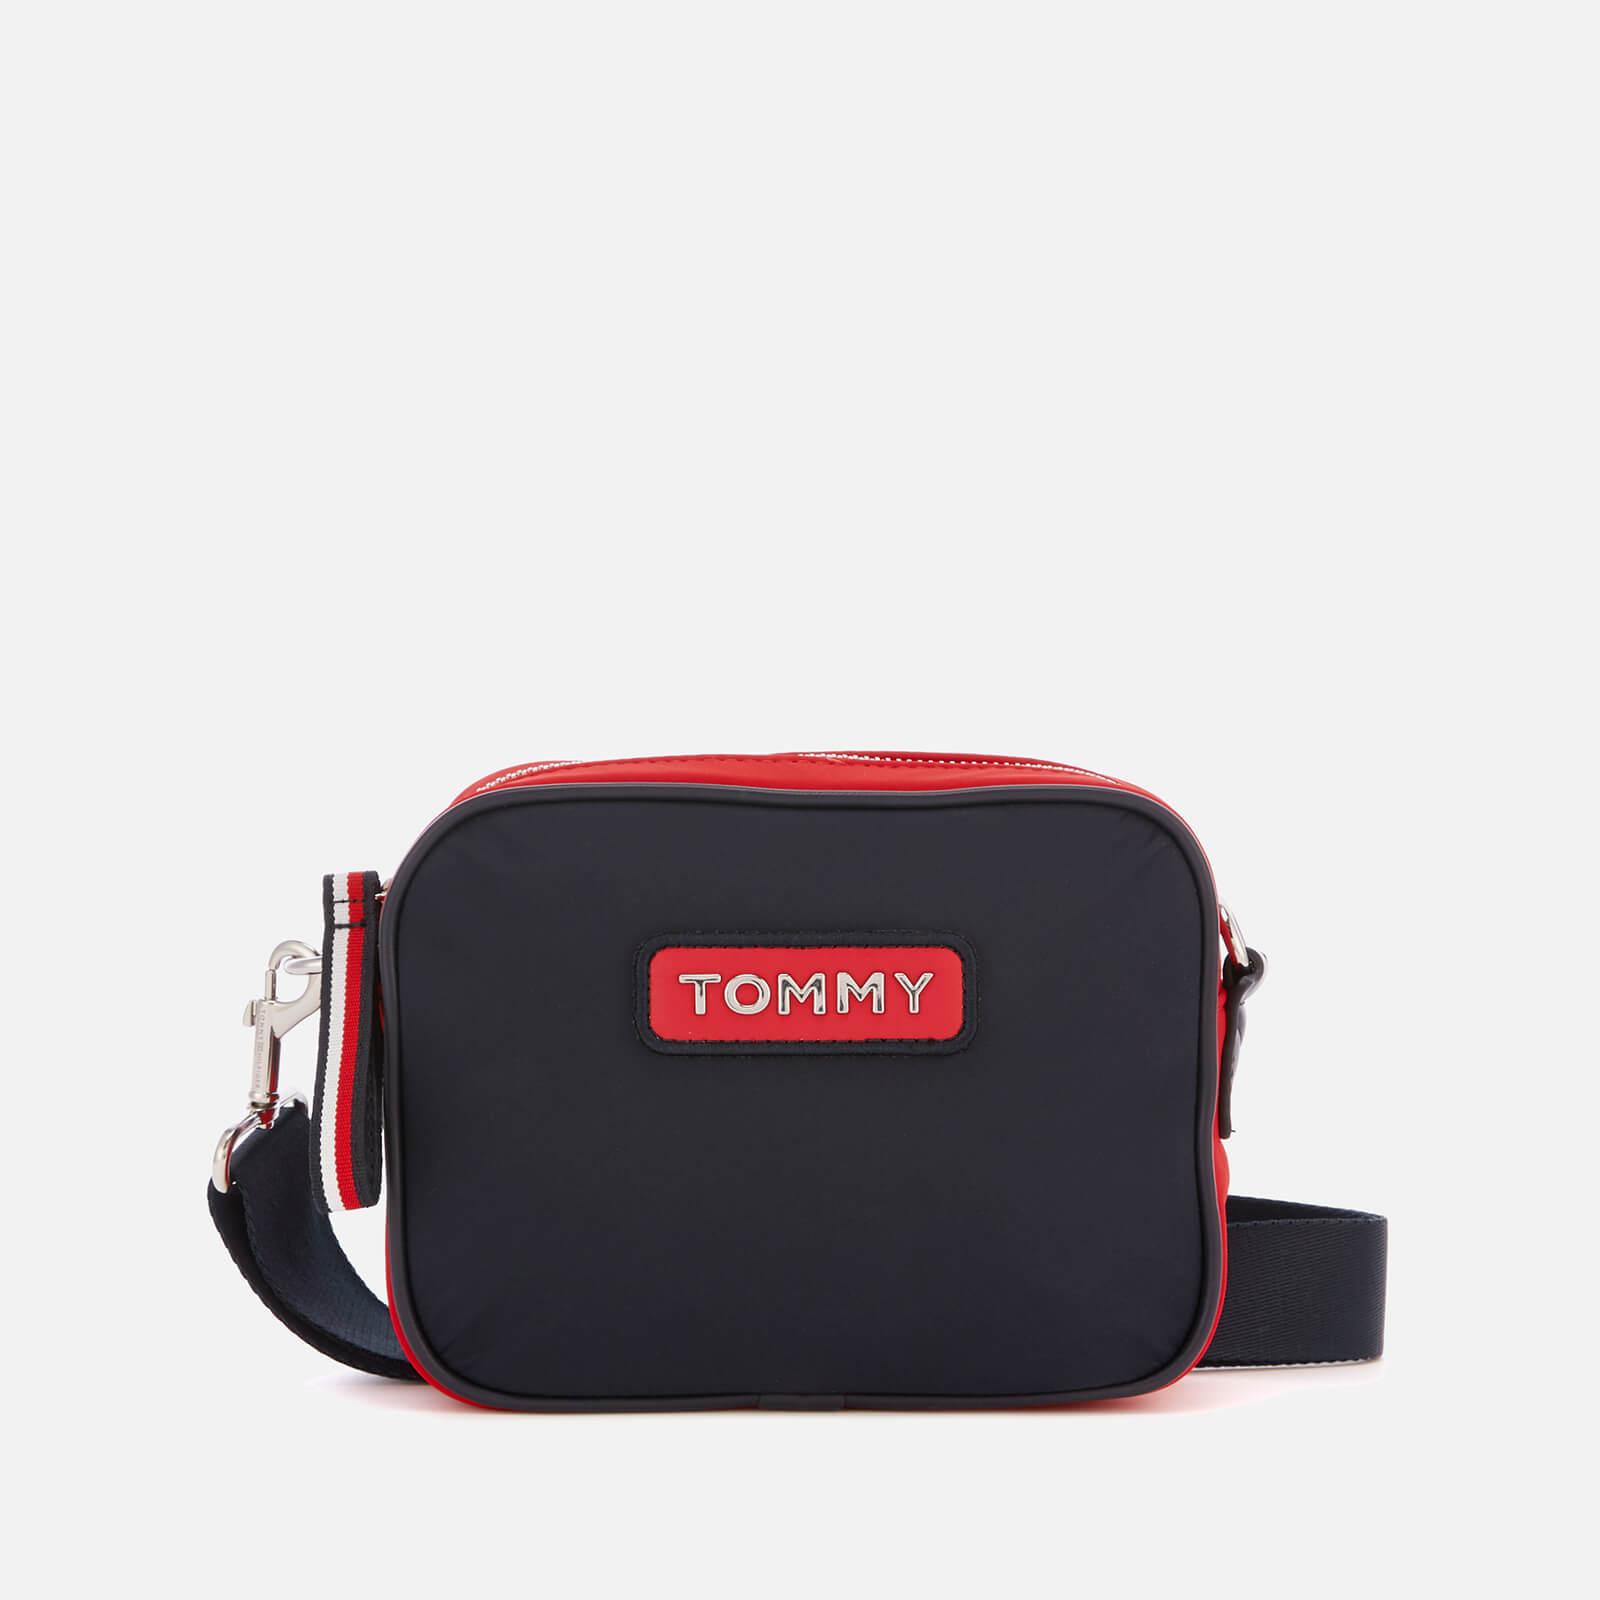 604f080a Tommy Hilfiger Women's Varsity Nylon Crossover Bag - Corporate